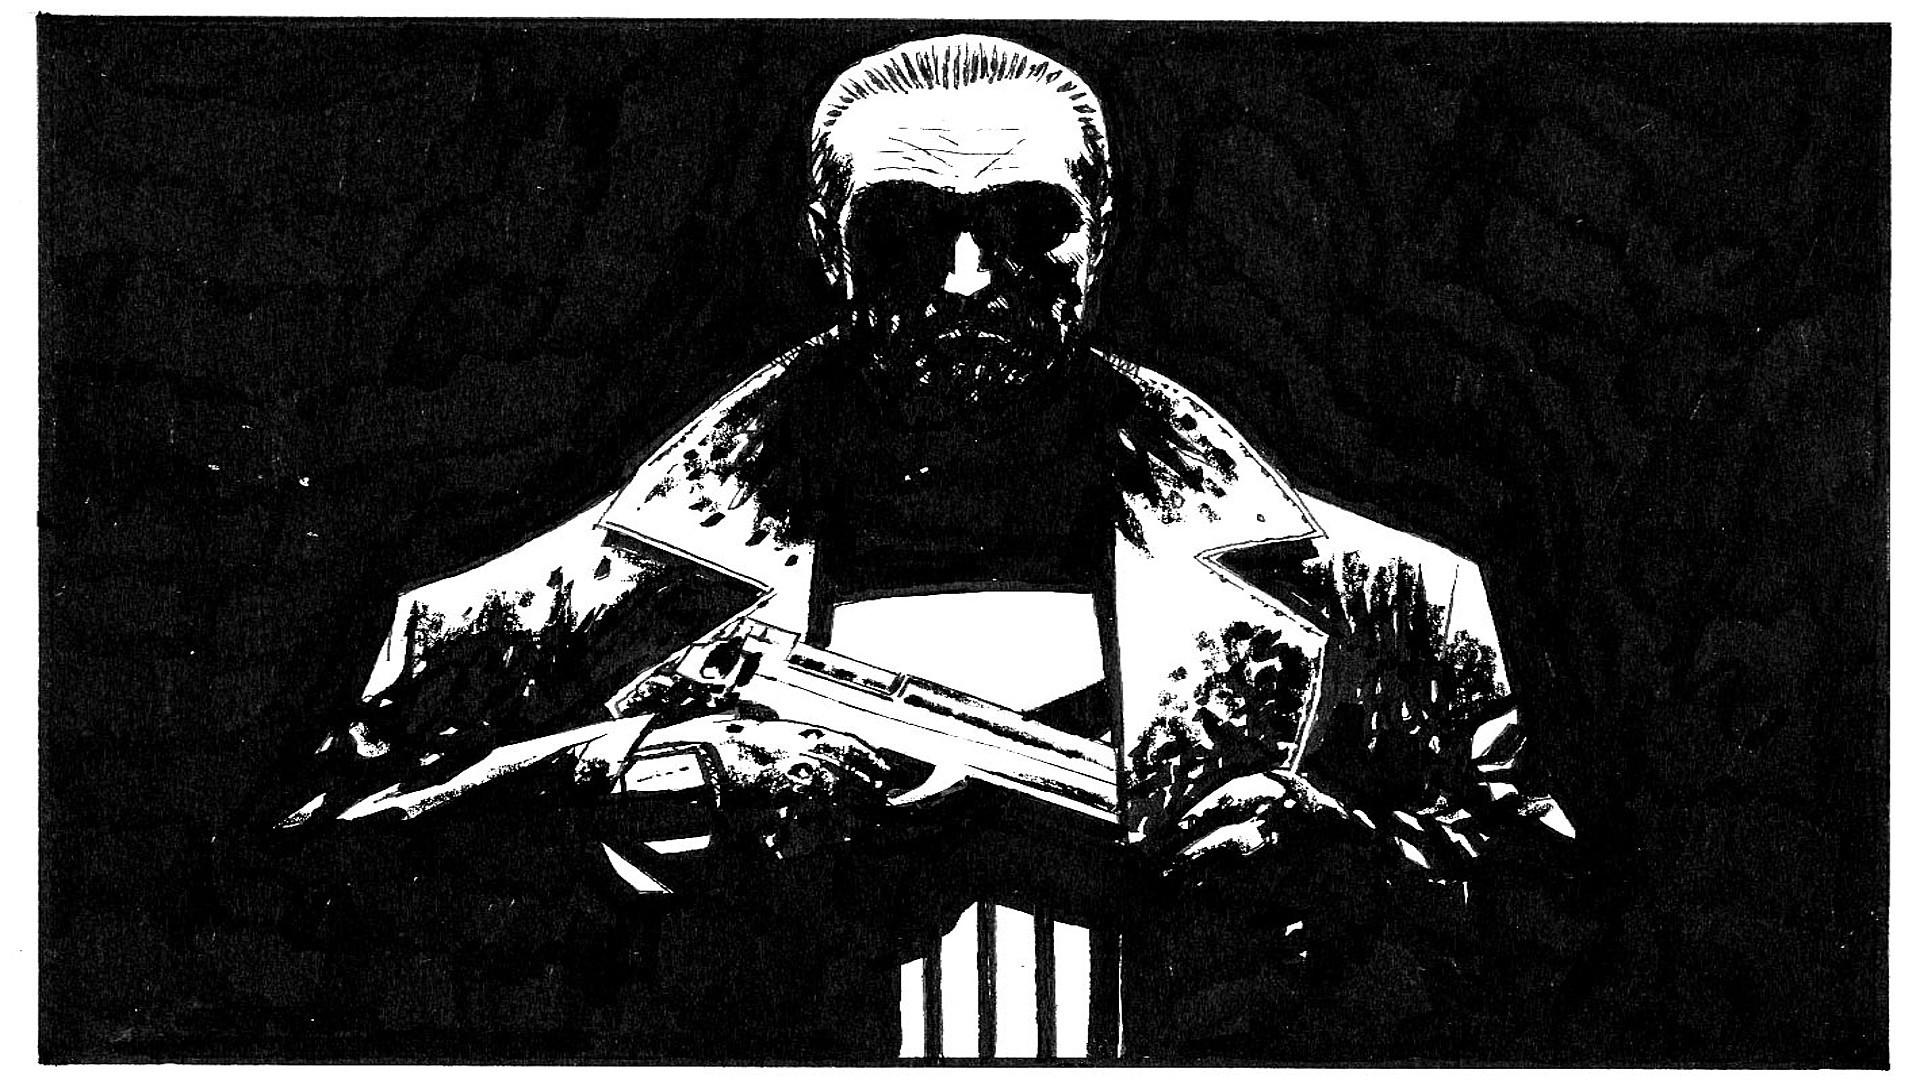 Comics – The Punisher Wallpaper